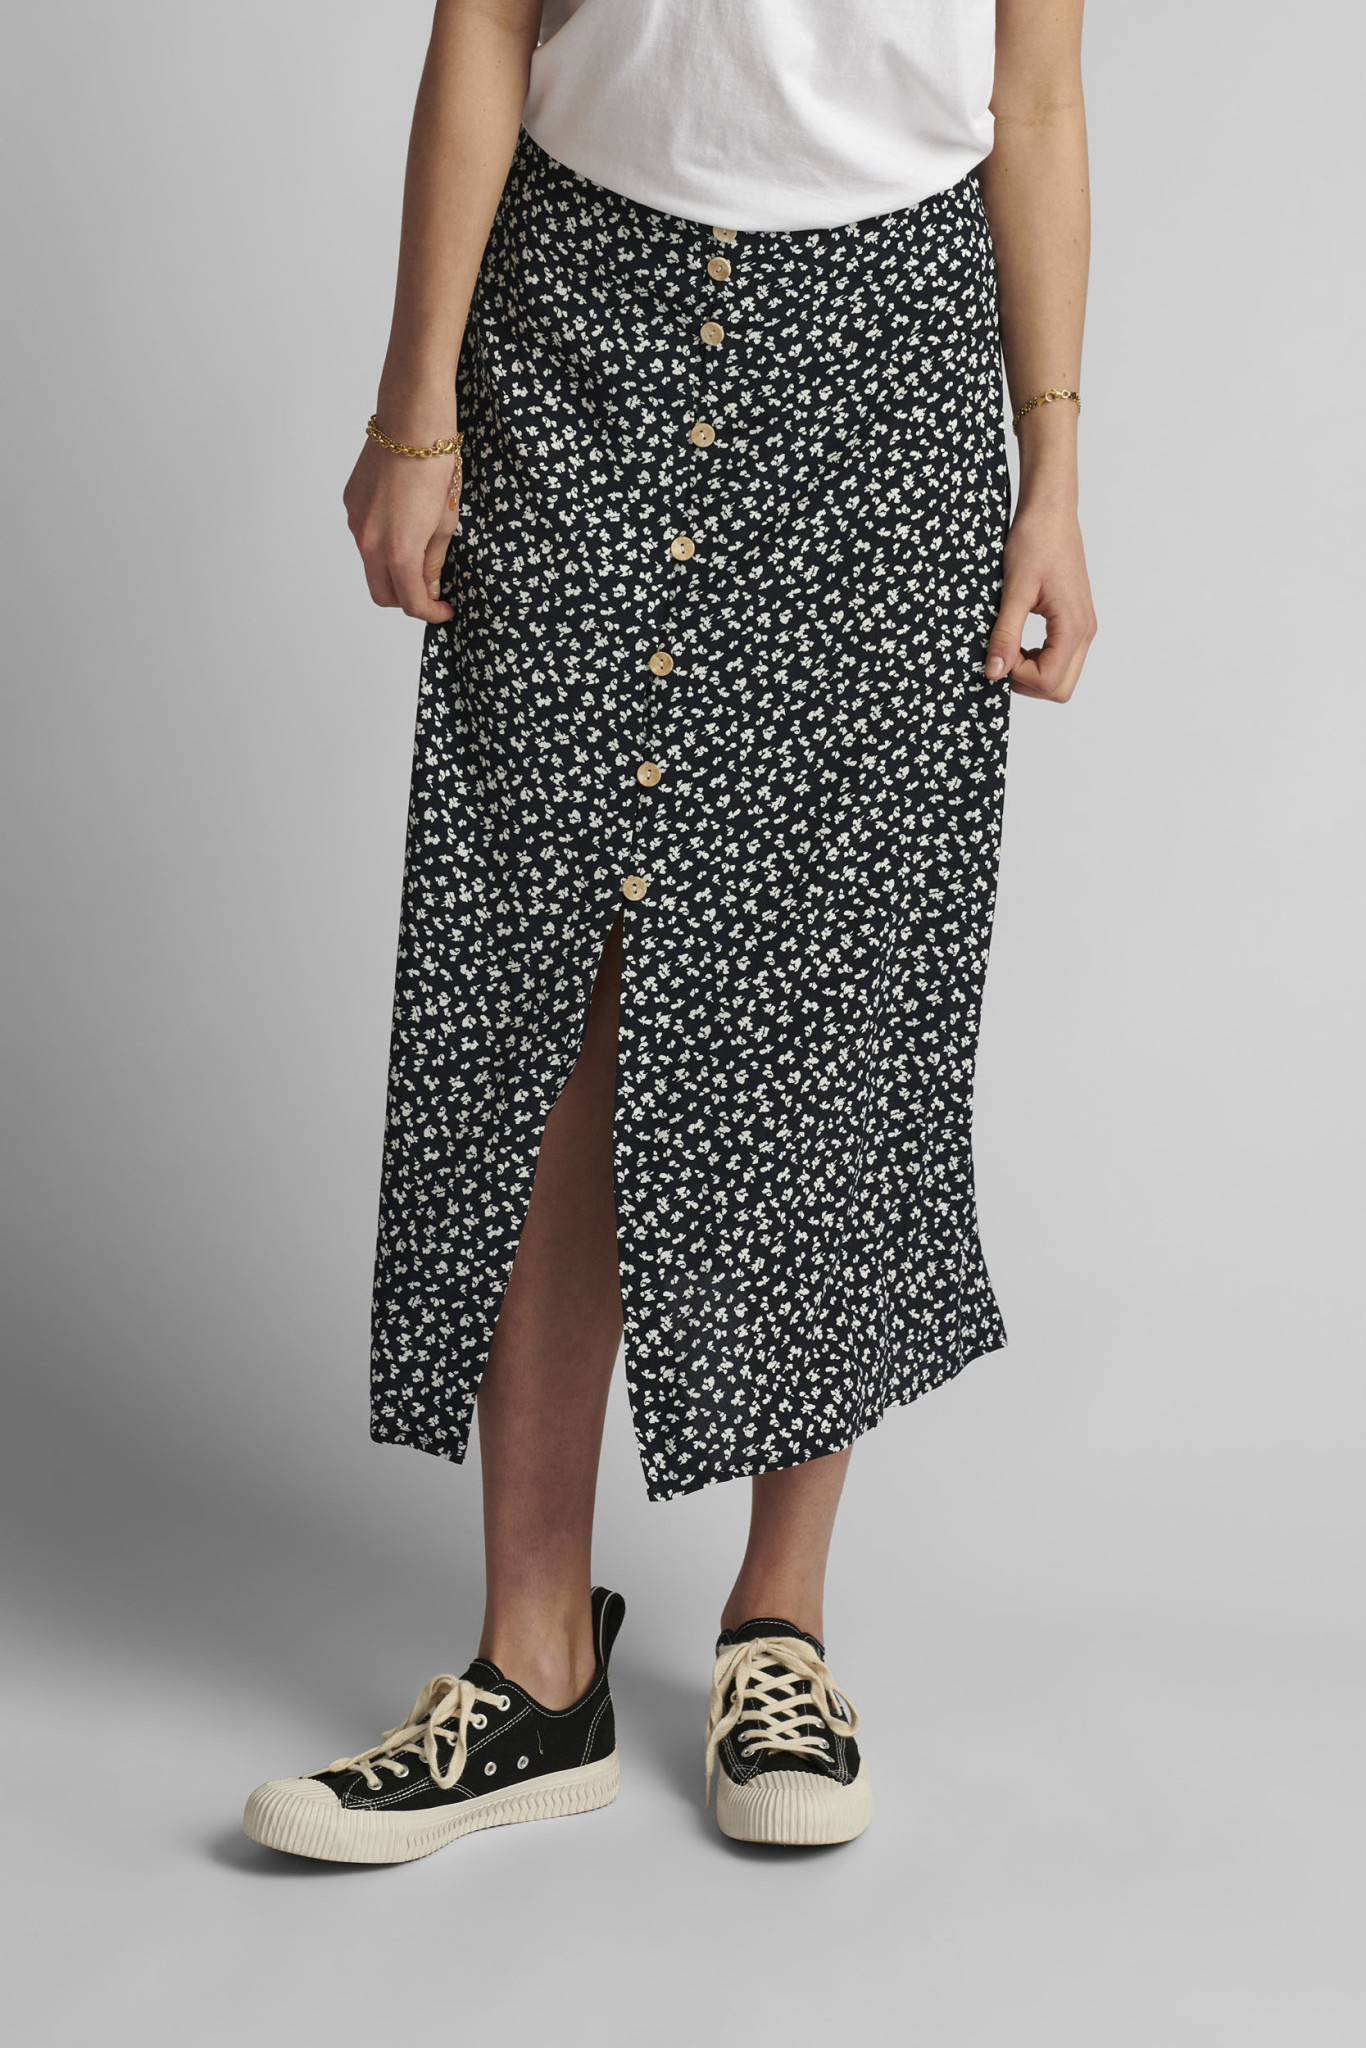 Nümph Carly Skirt